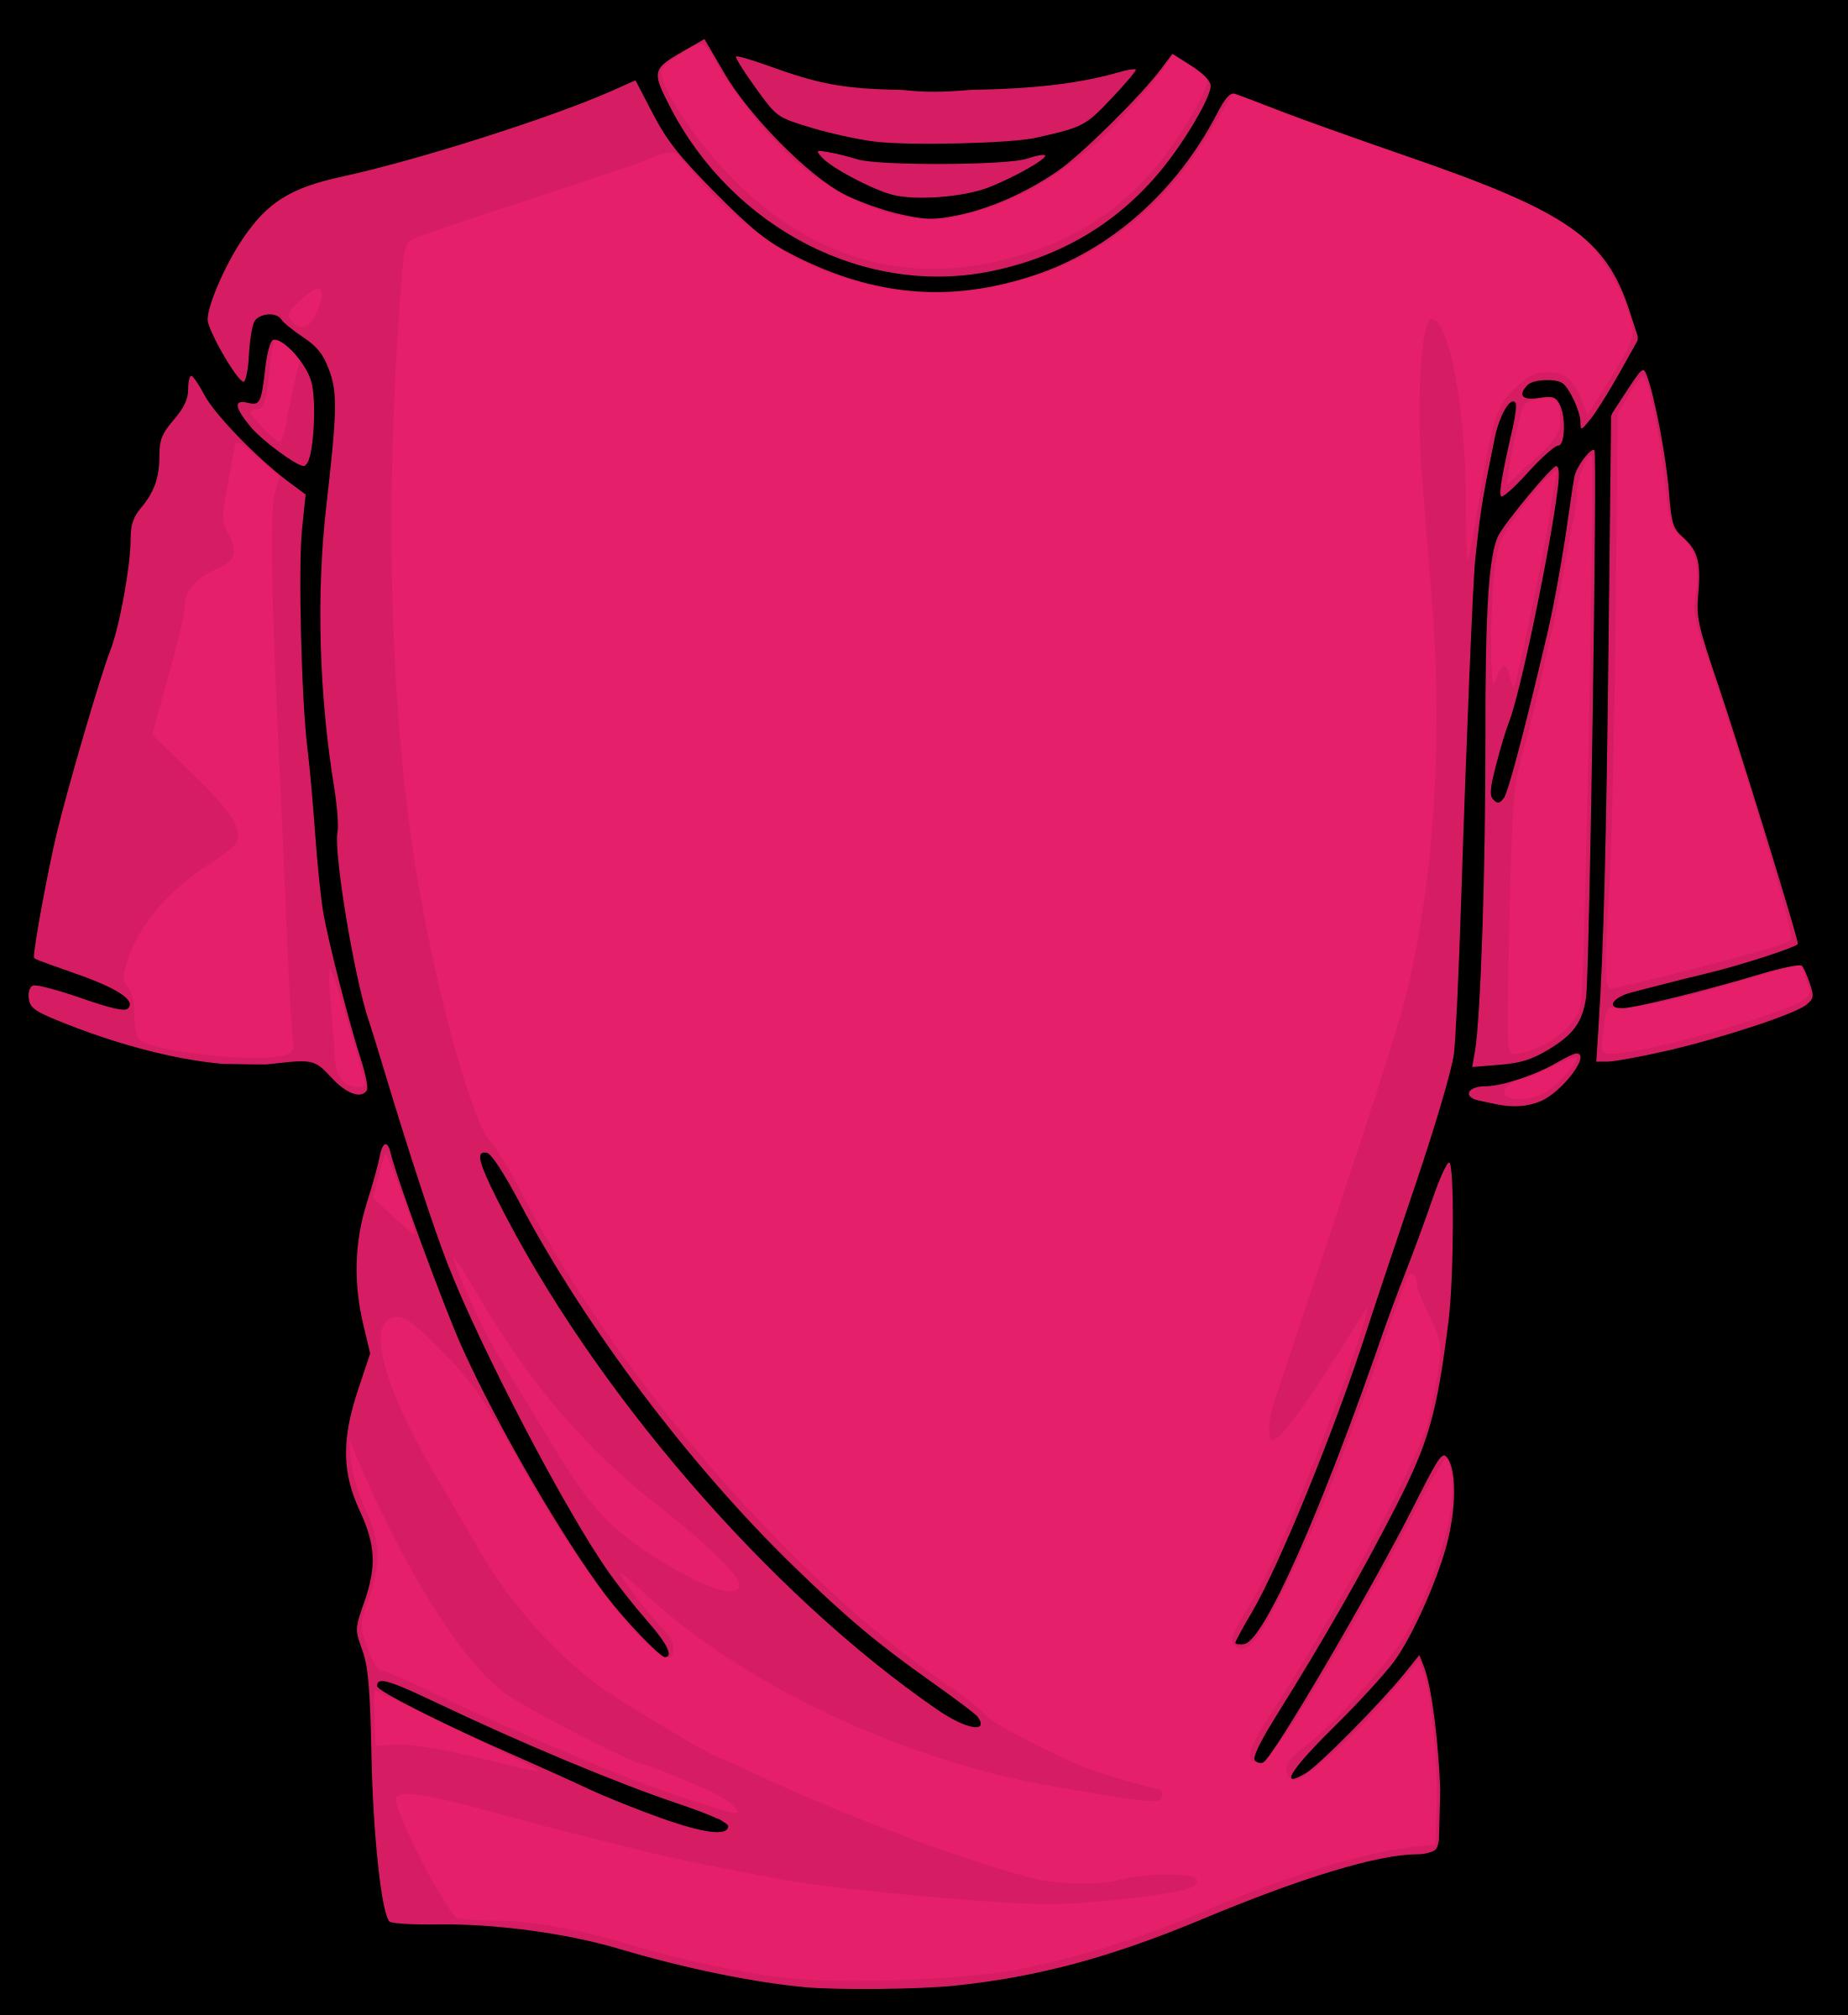 Colored tshirt frames illustrations. Maracas clipart cute